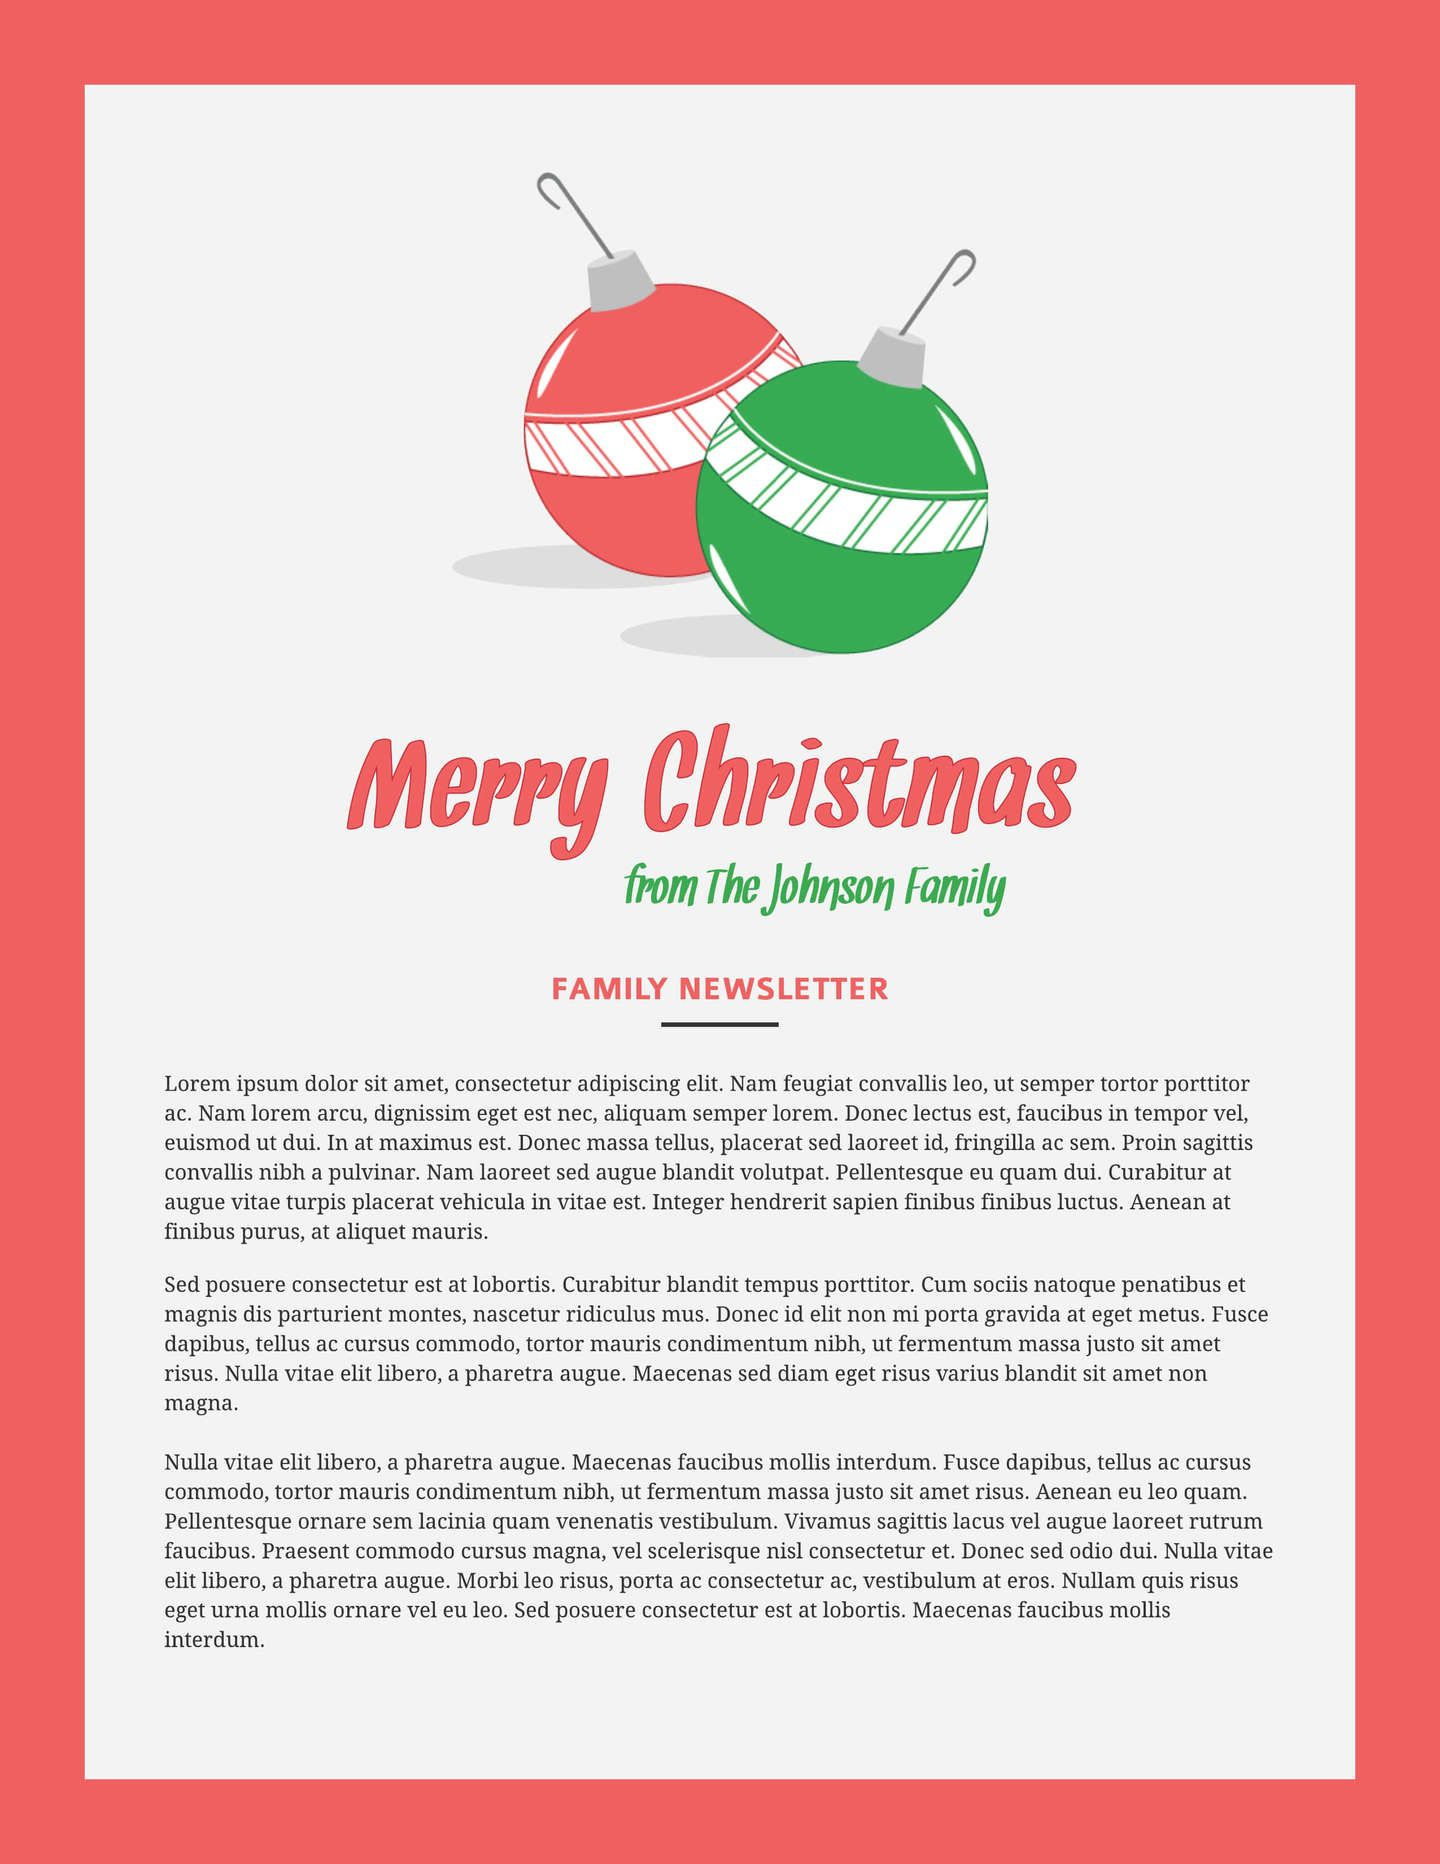 007 Impressive Free Christma Newsletter Template Microsoft Word High Resolution Full